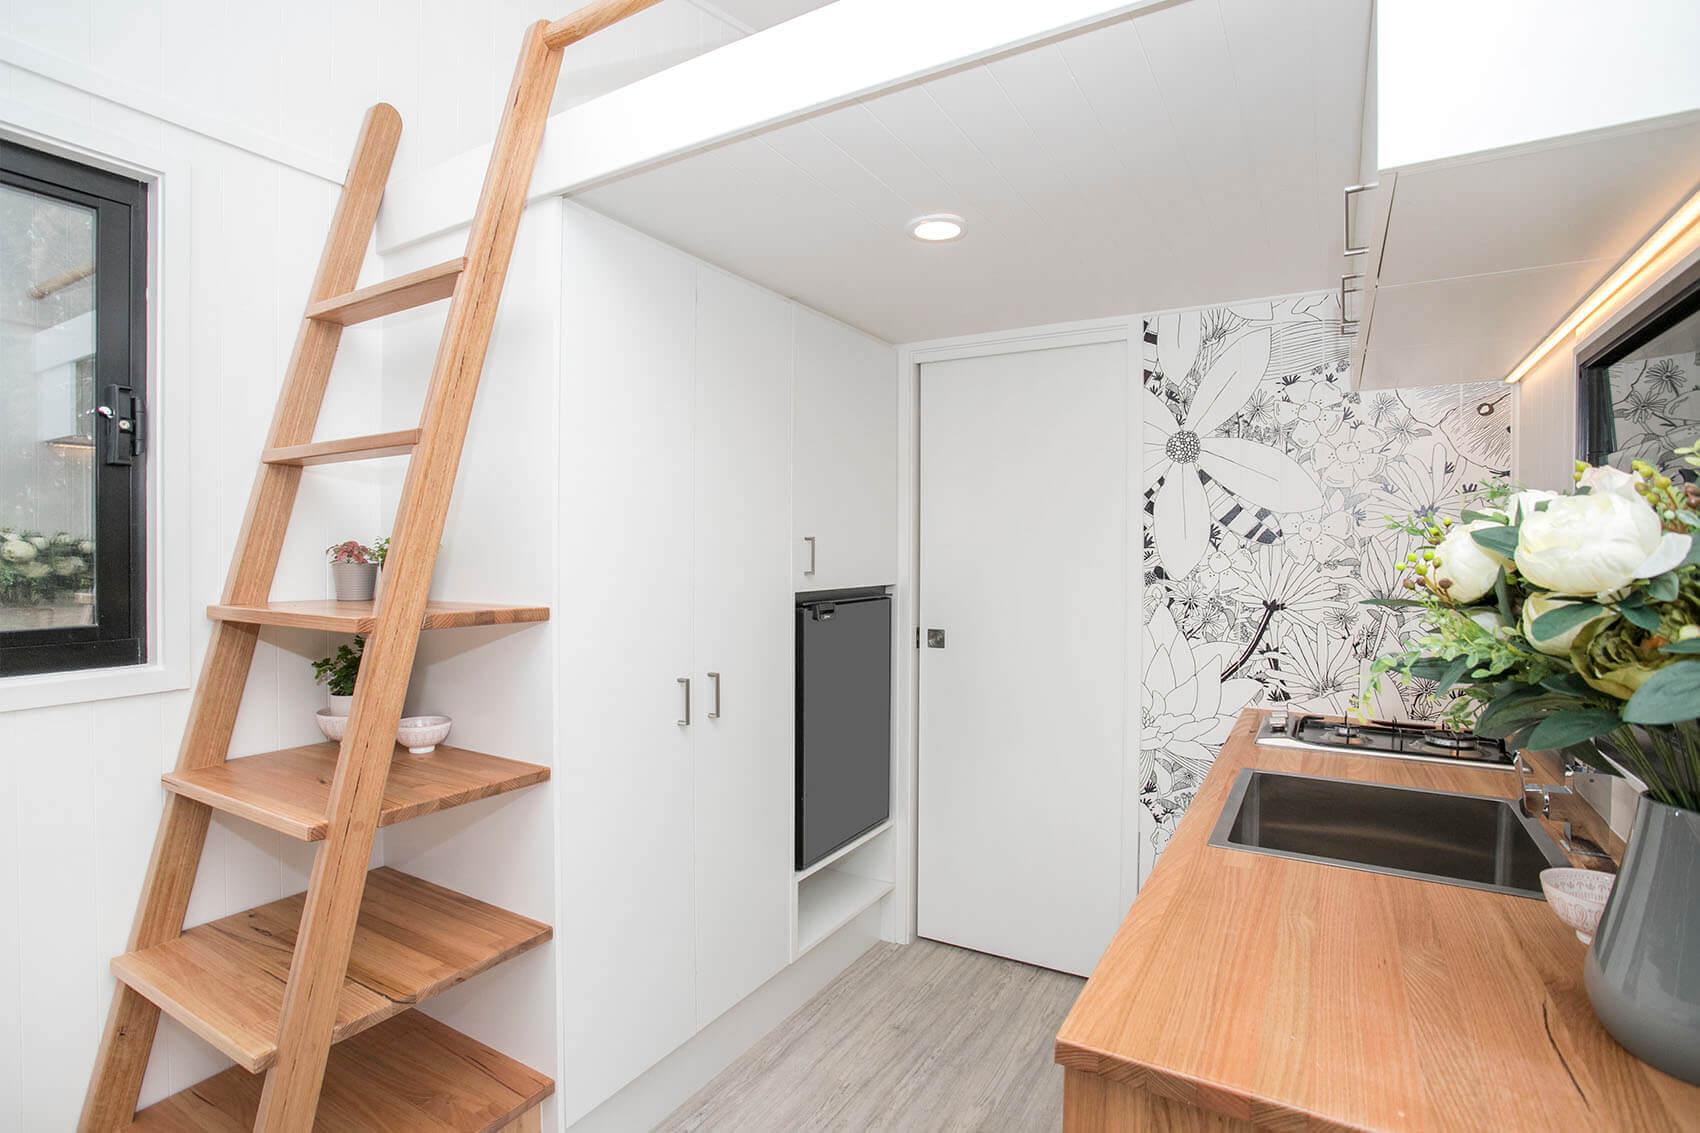 Inside of Tiny home